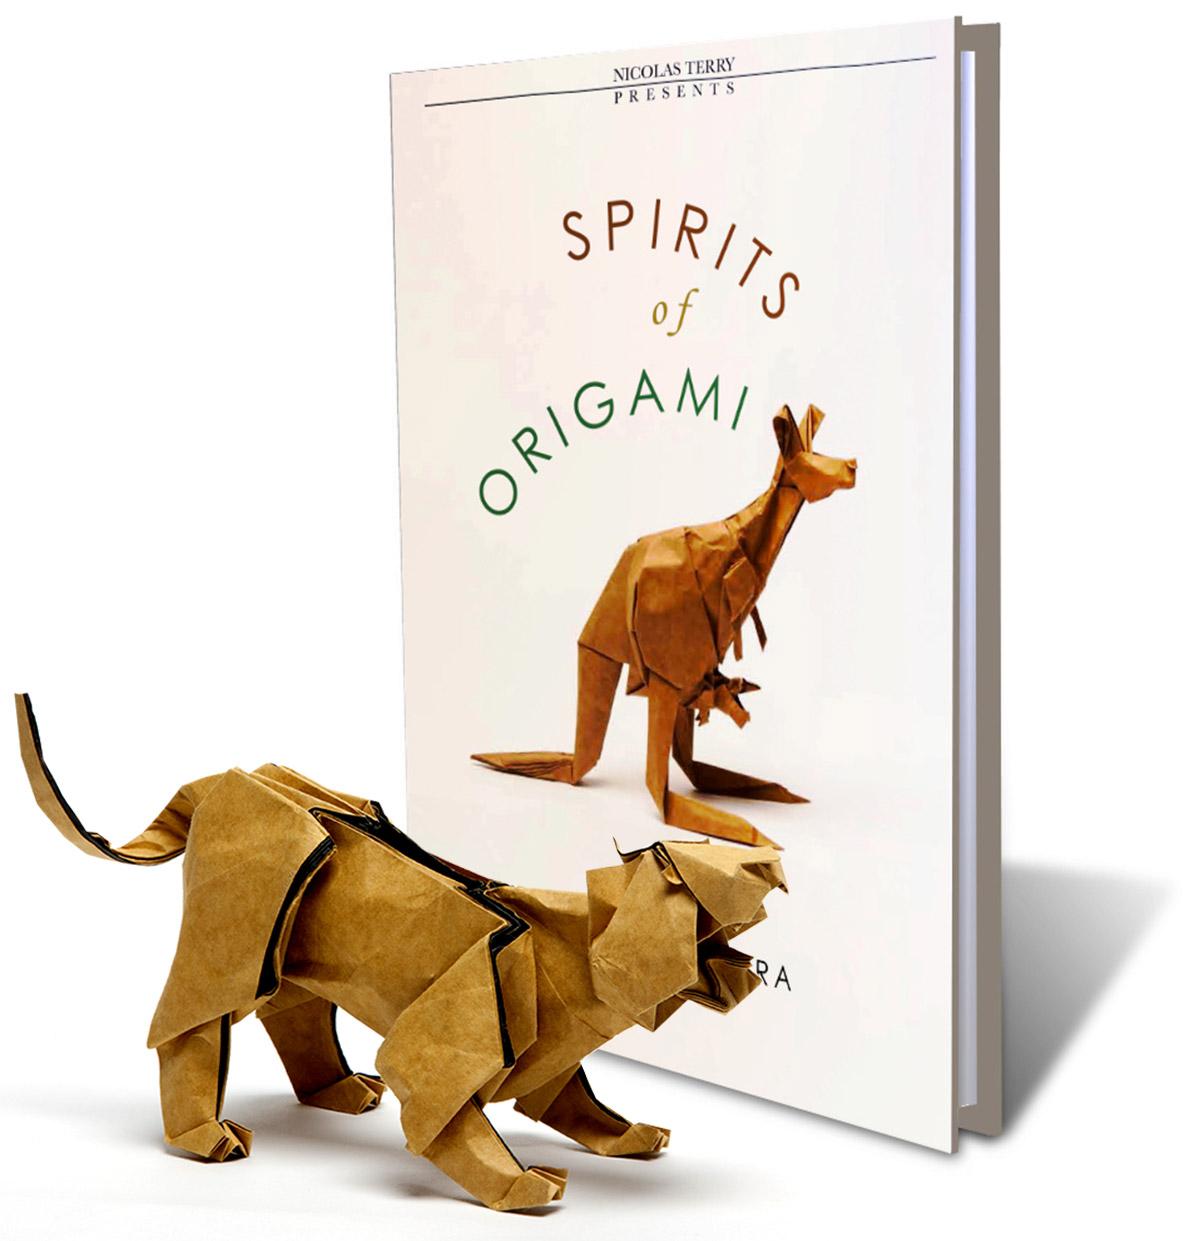 #8 Spirits of Origami